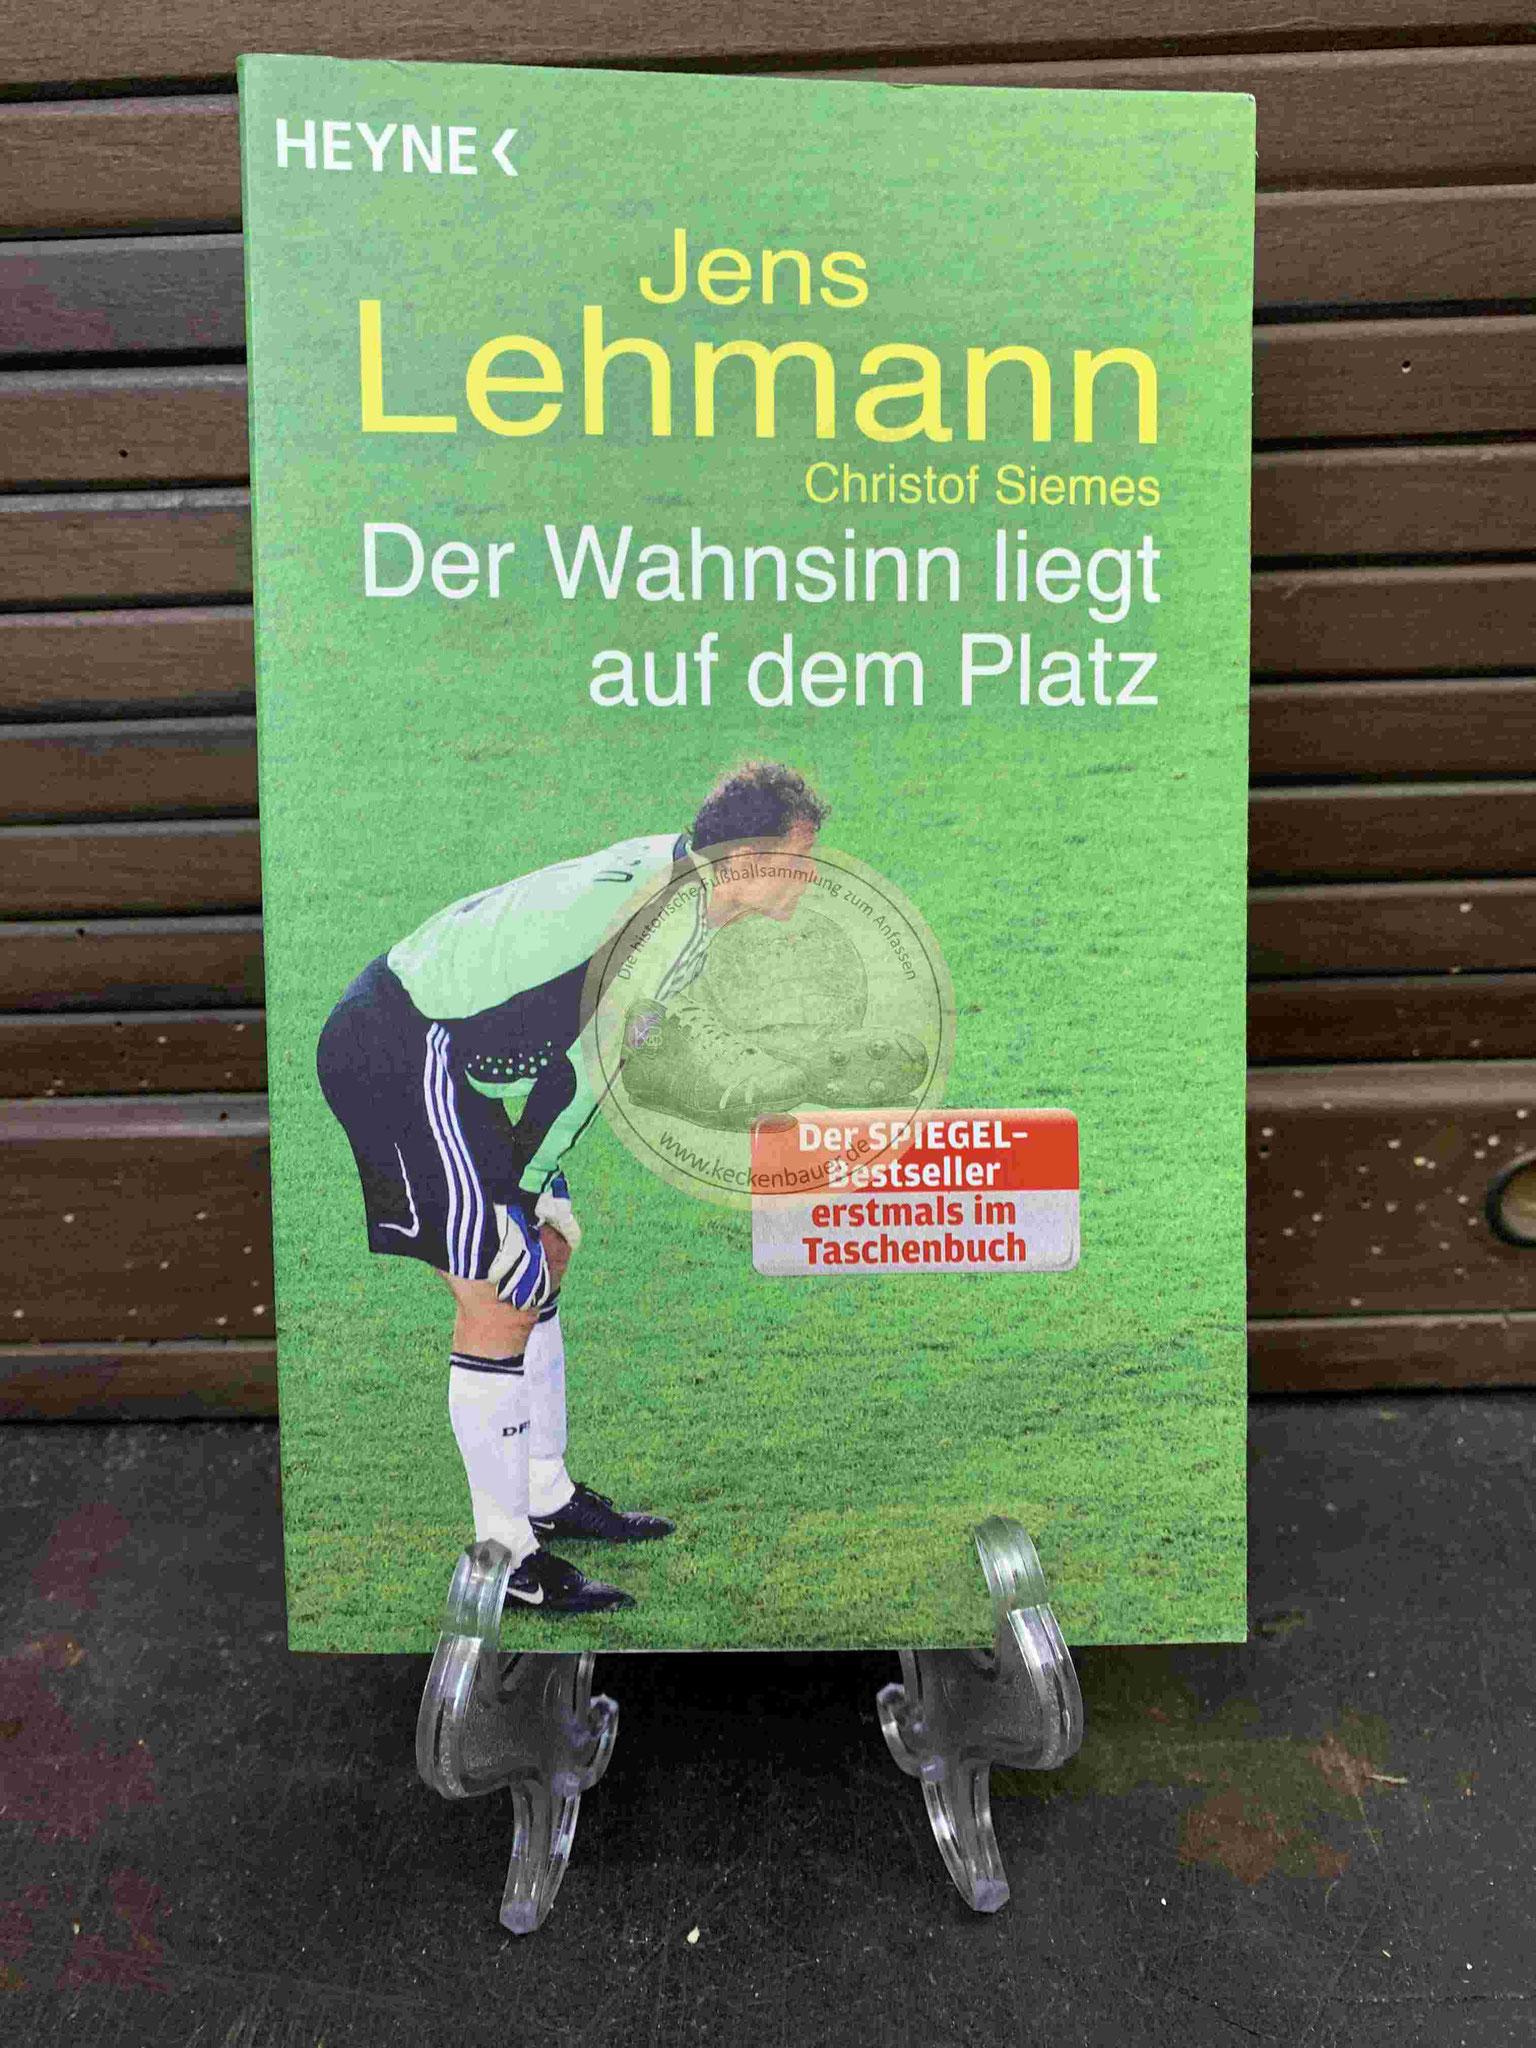 Jens Lehmann Der Wahnsinn liegt auf dem Platz aus dem Jahr 2011